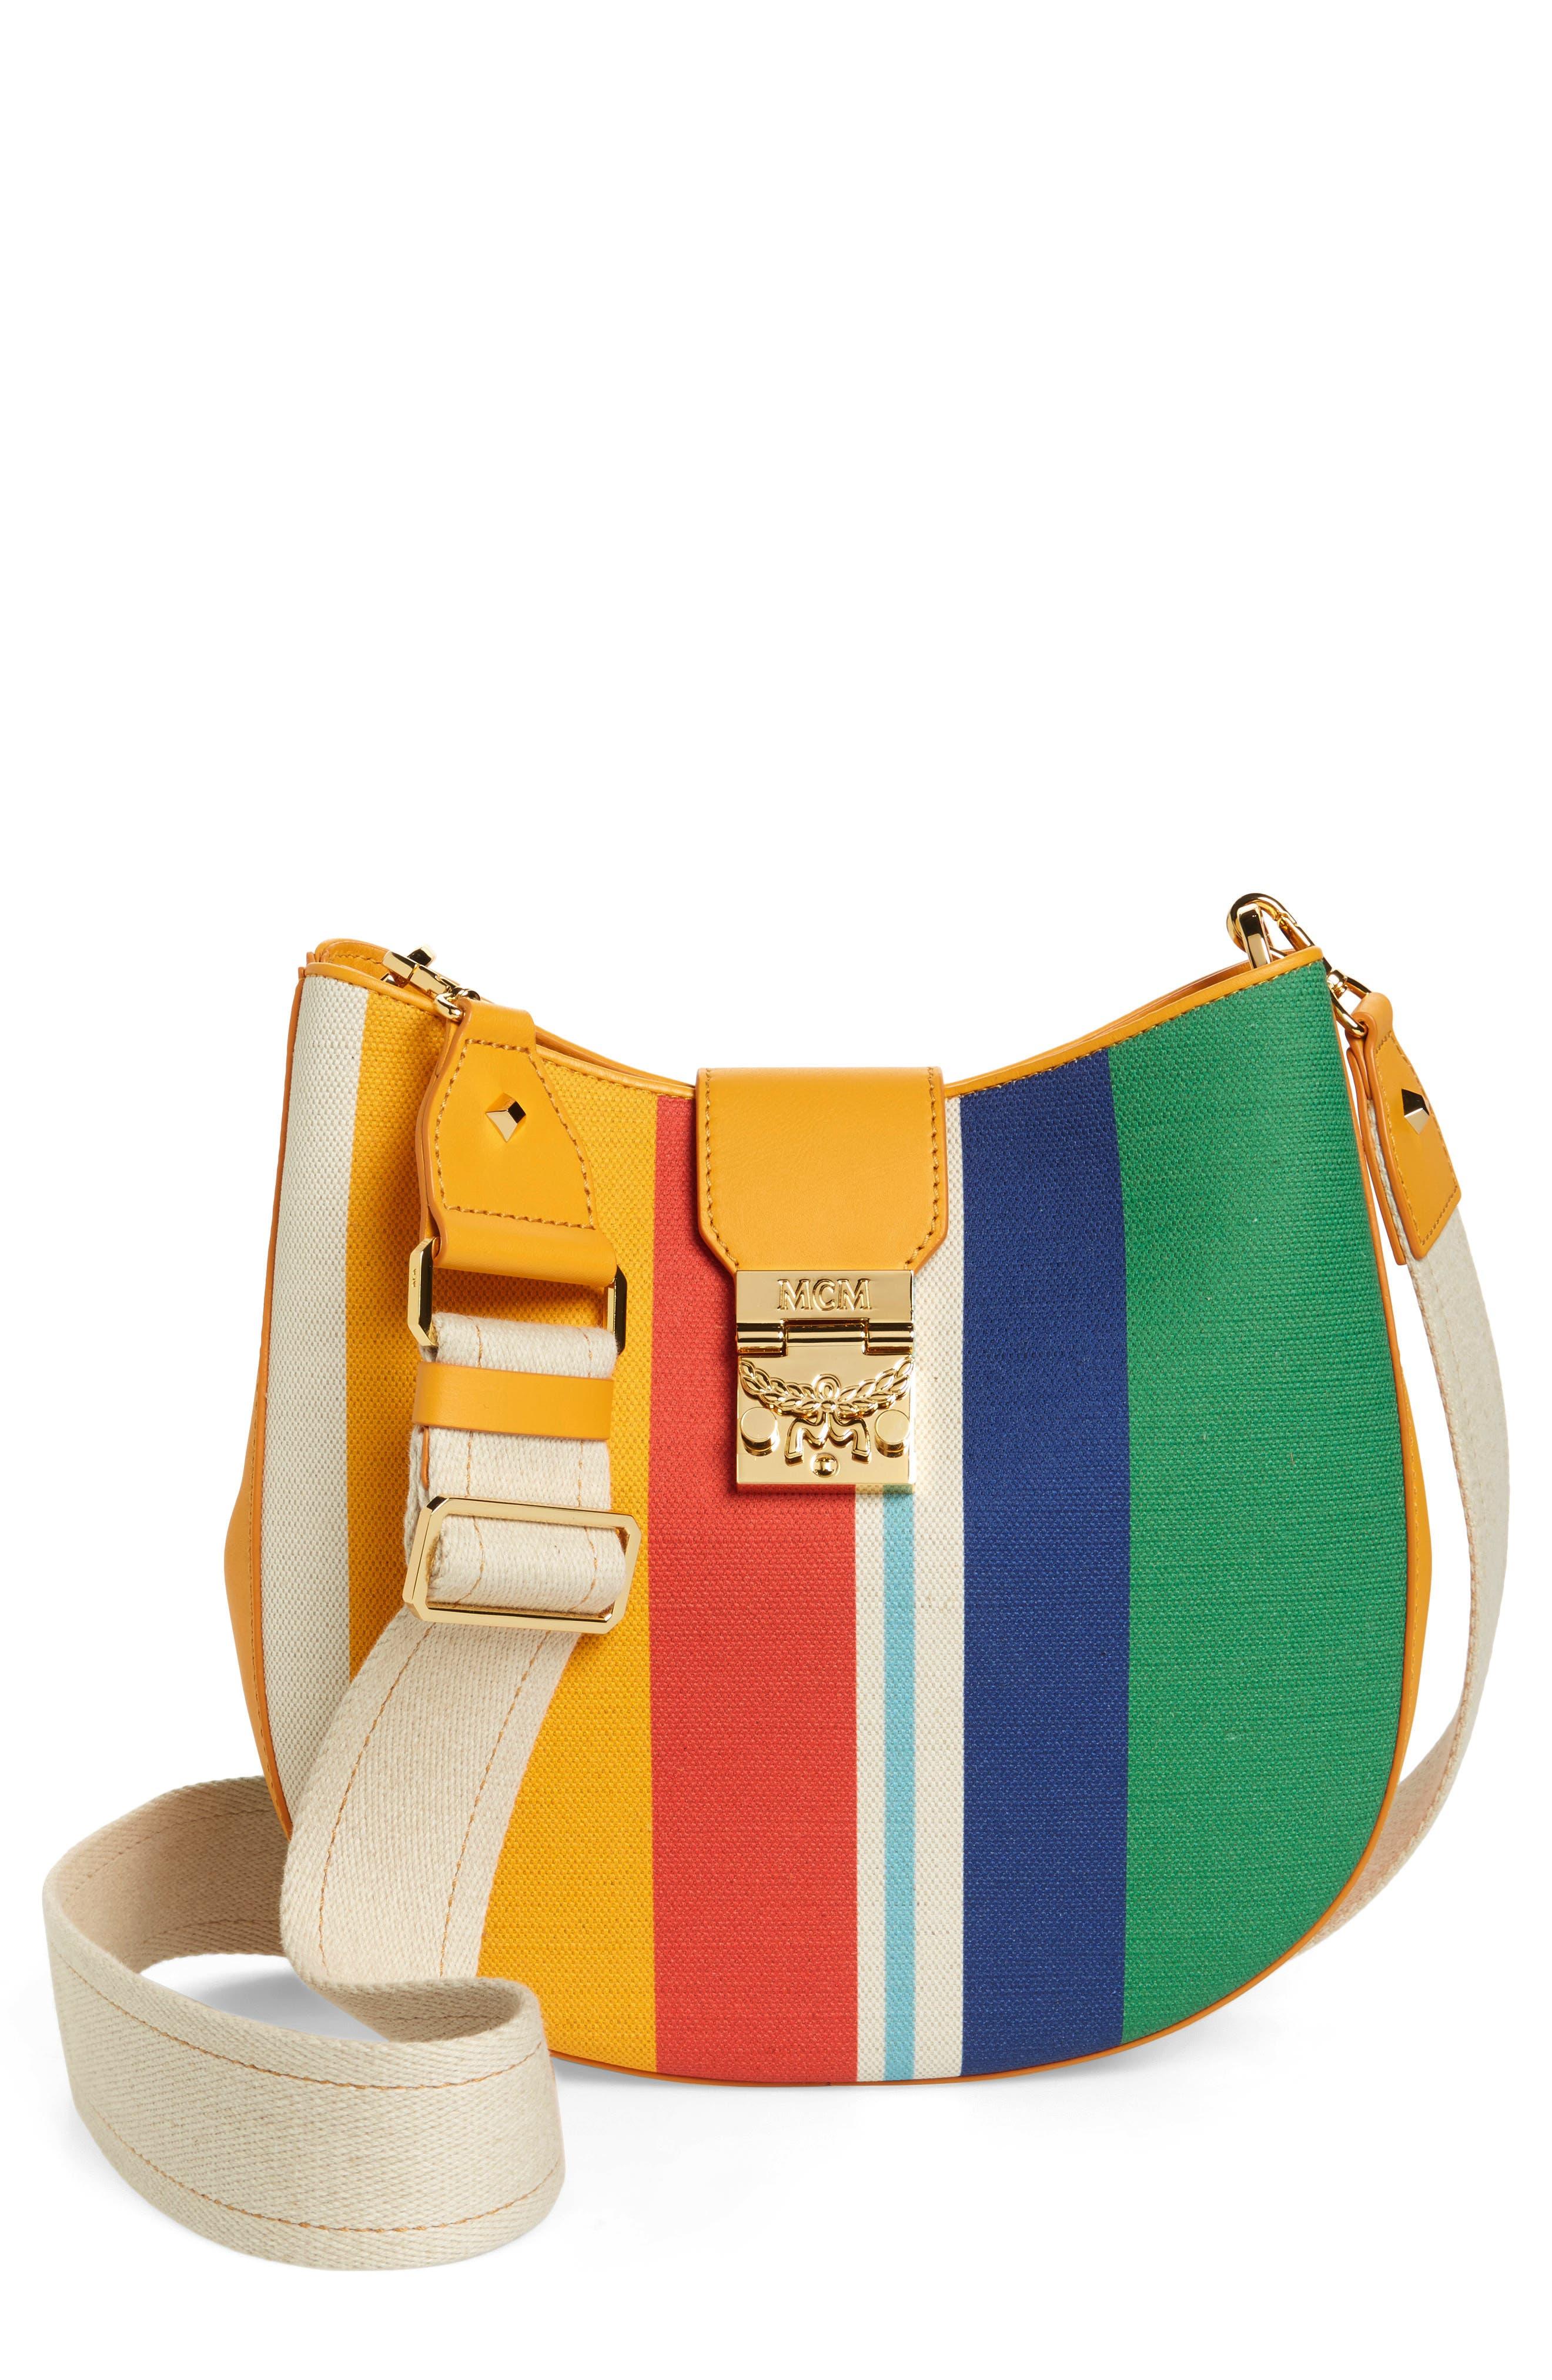 Medium Patricia Canvas Hobo Bag,                             Main thumbnail 1, color,                             Rainbow Yellow